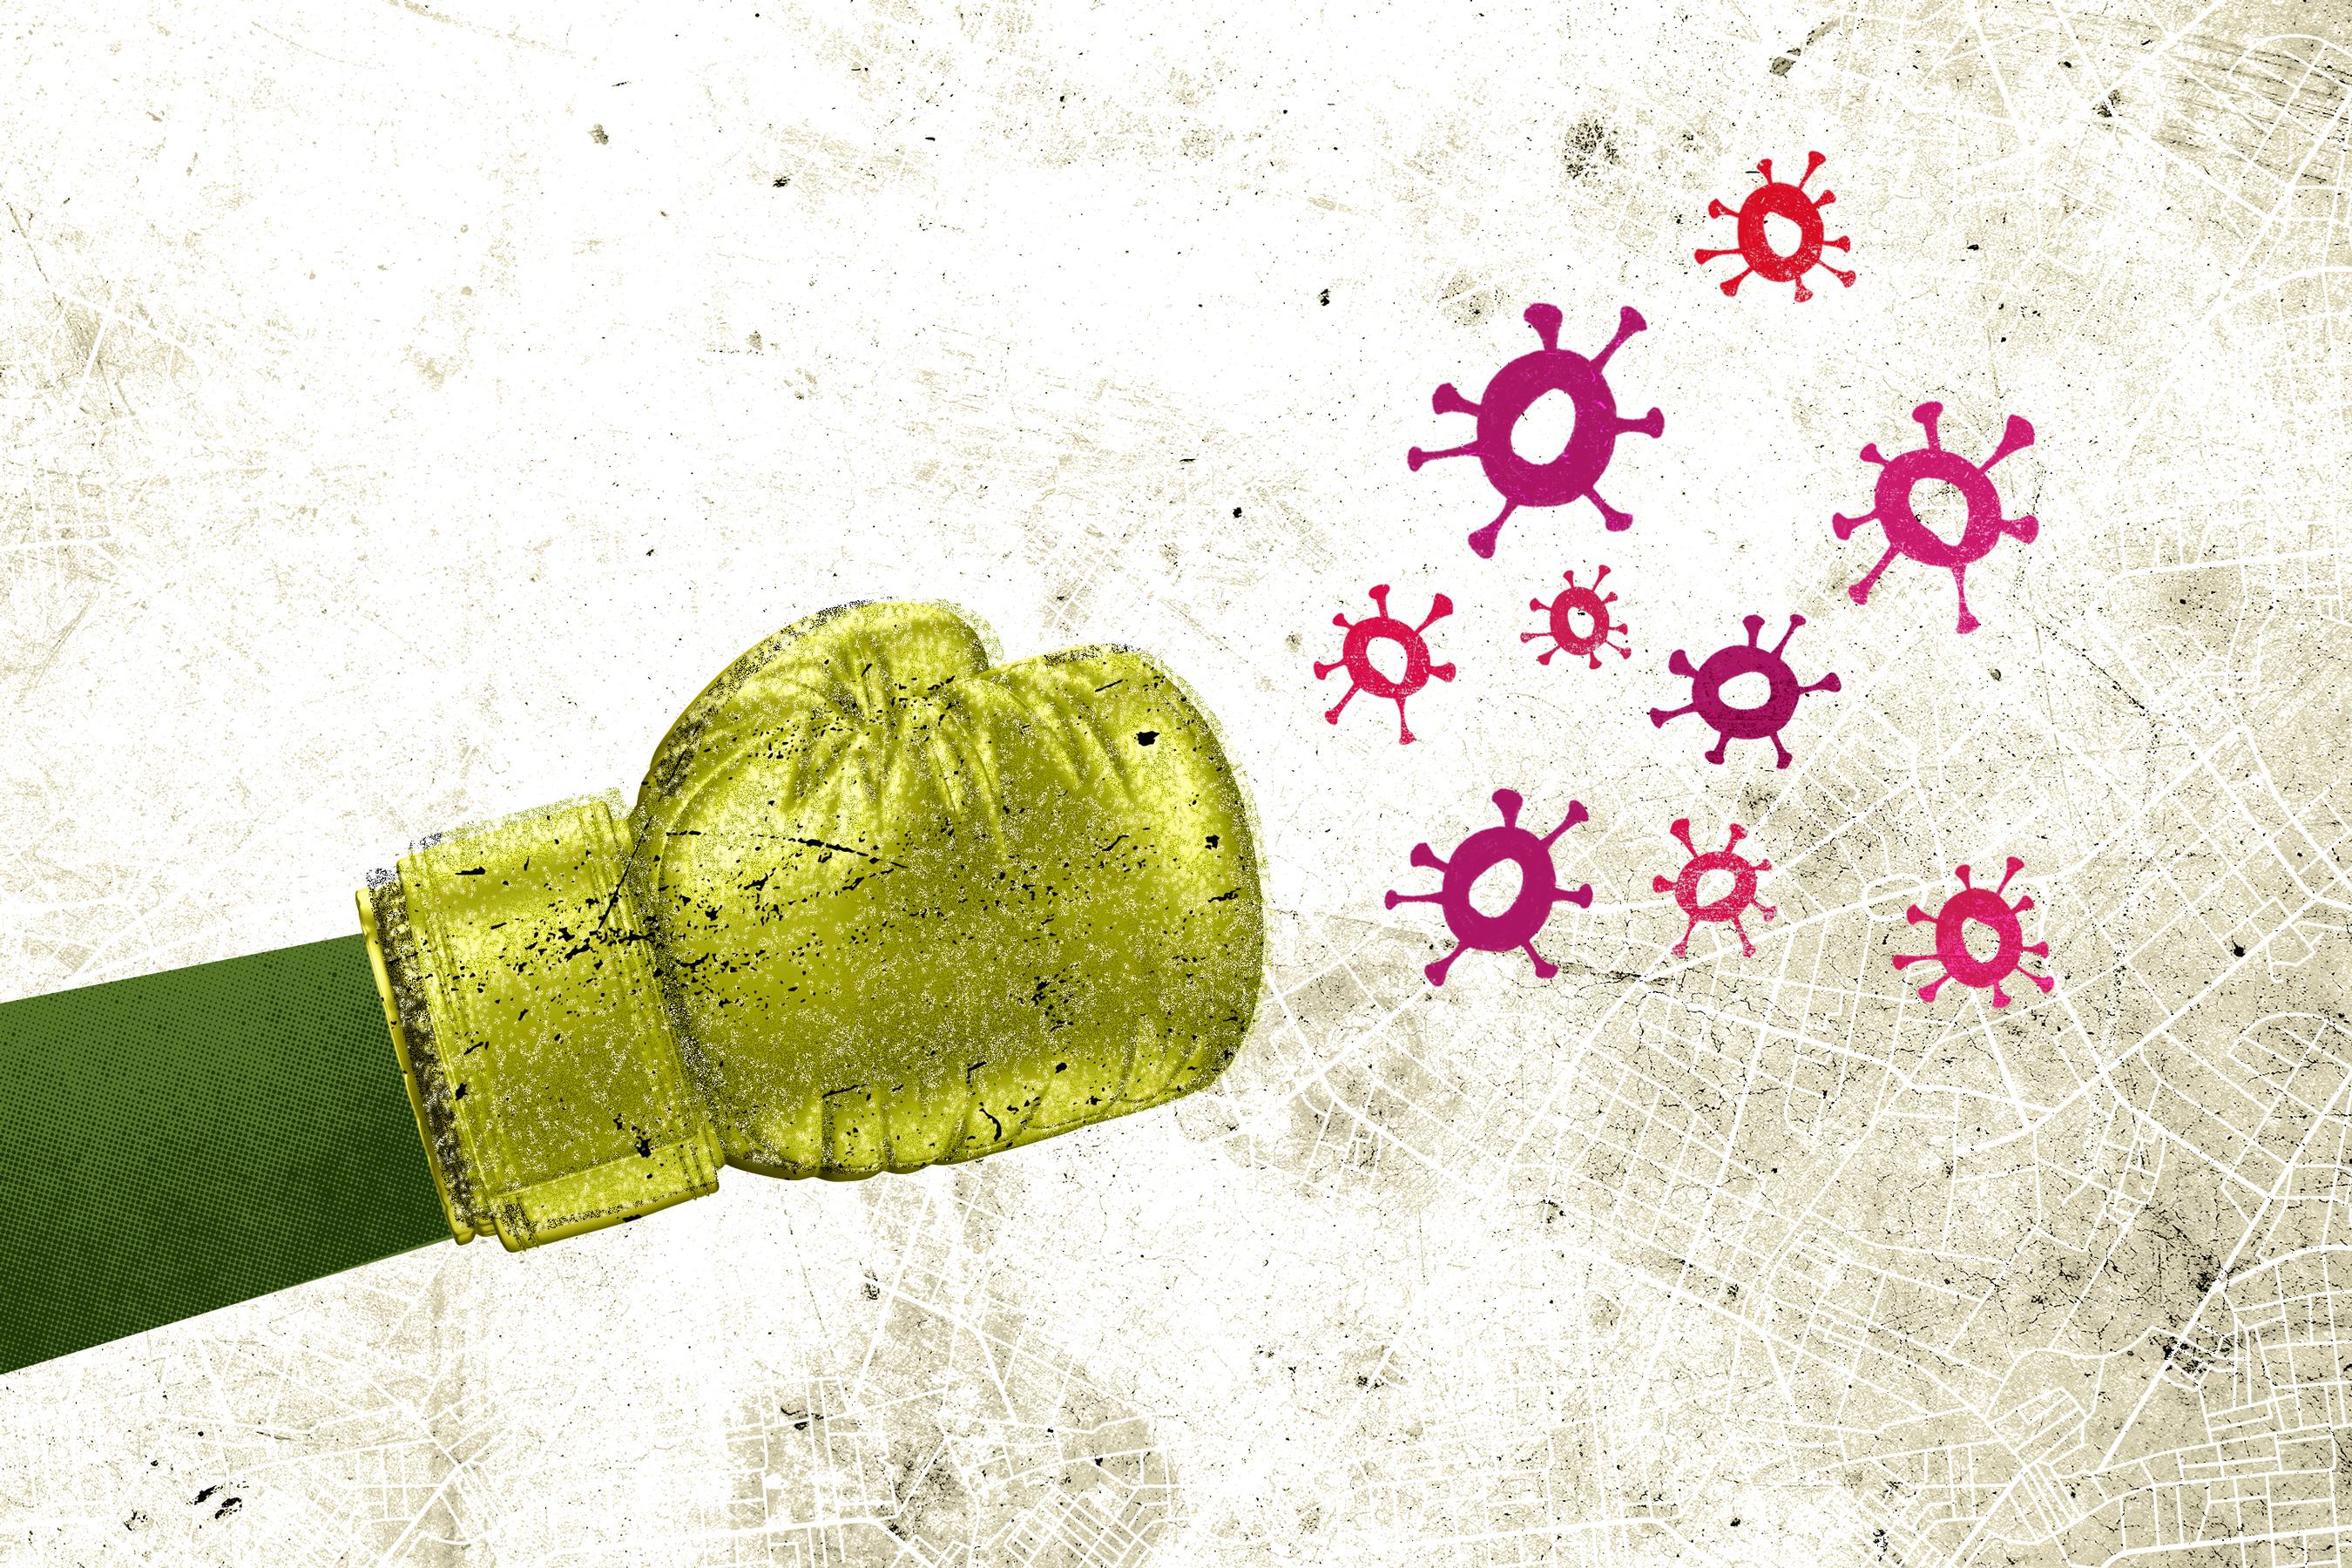 New studies suggest people get 'superhuman' immunity to the novel coronavirus. So how do you get it?